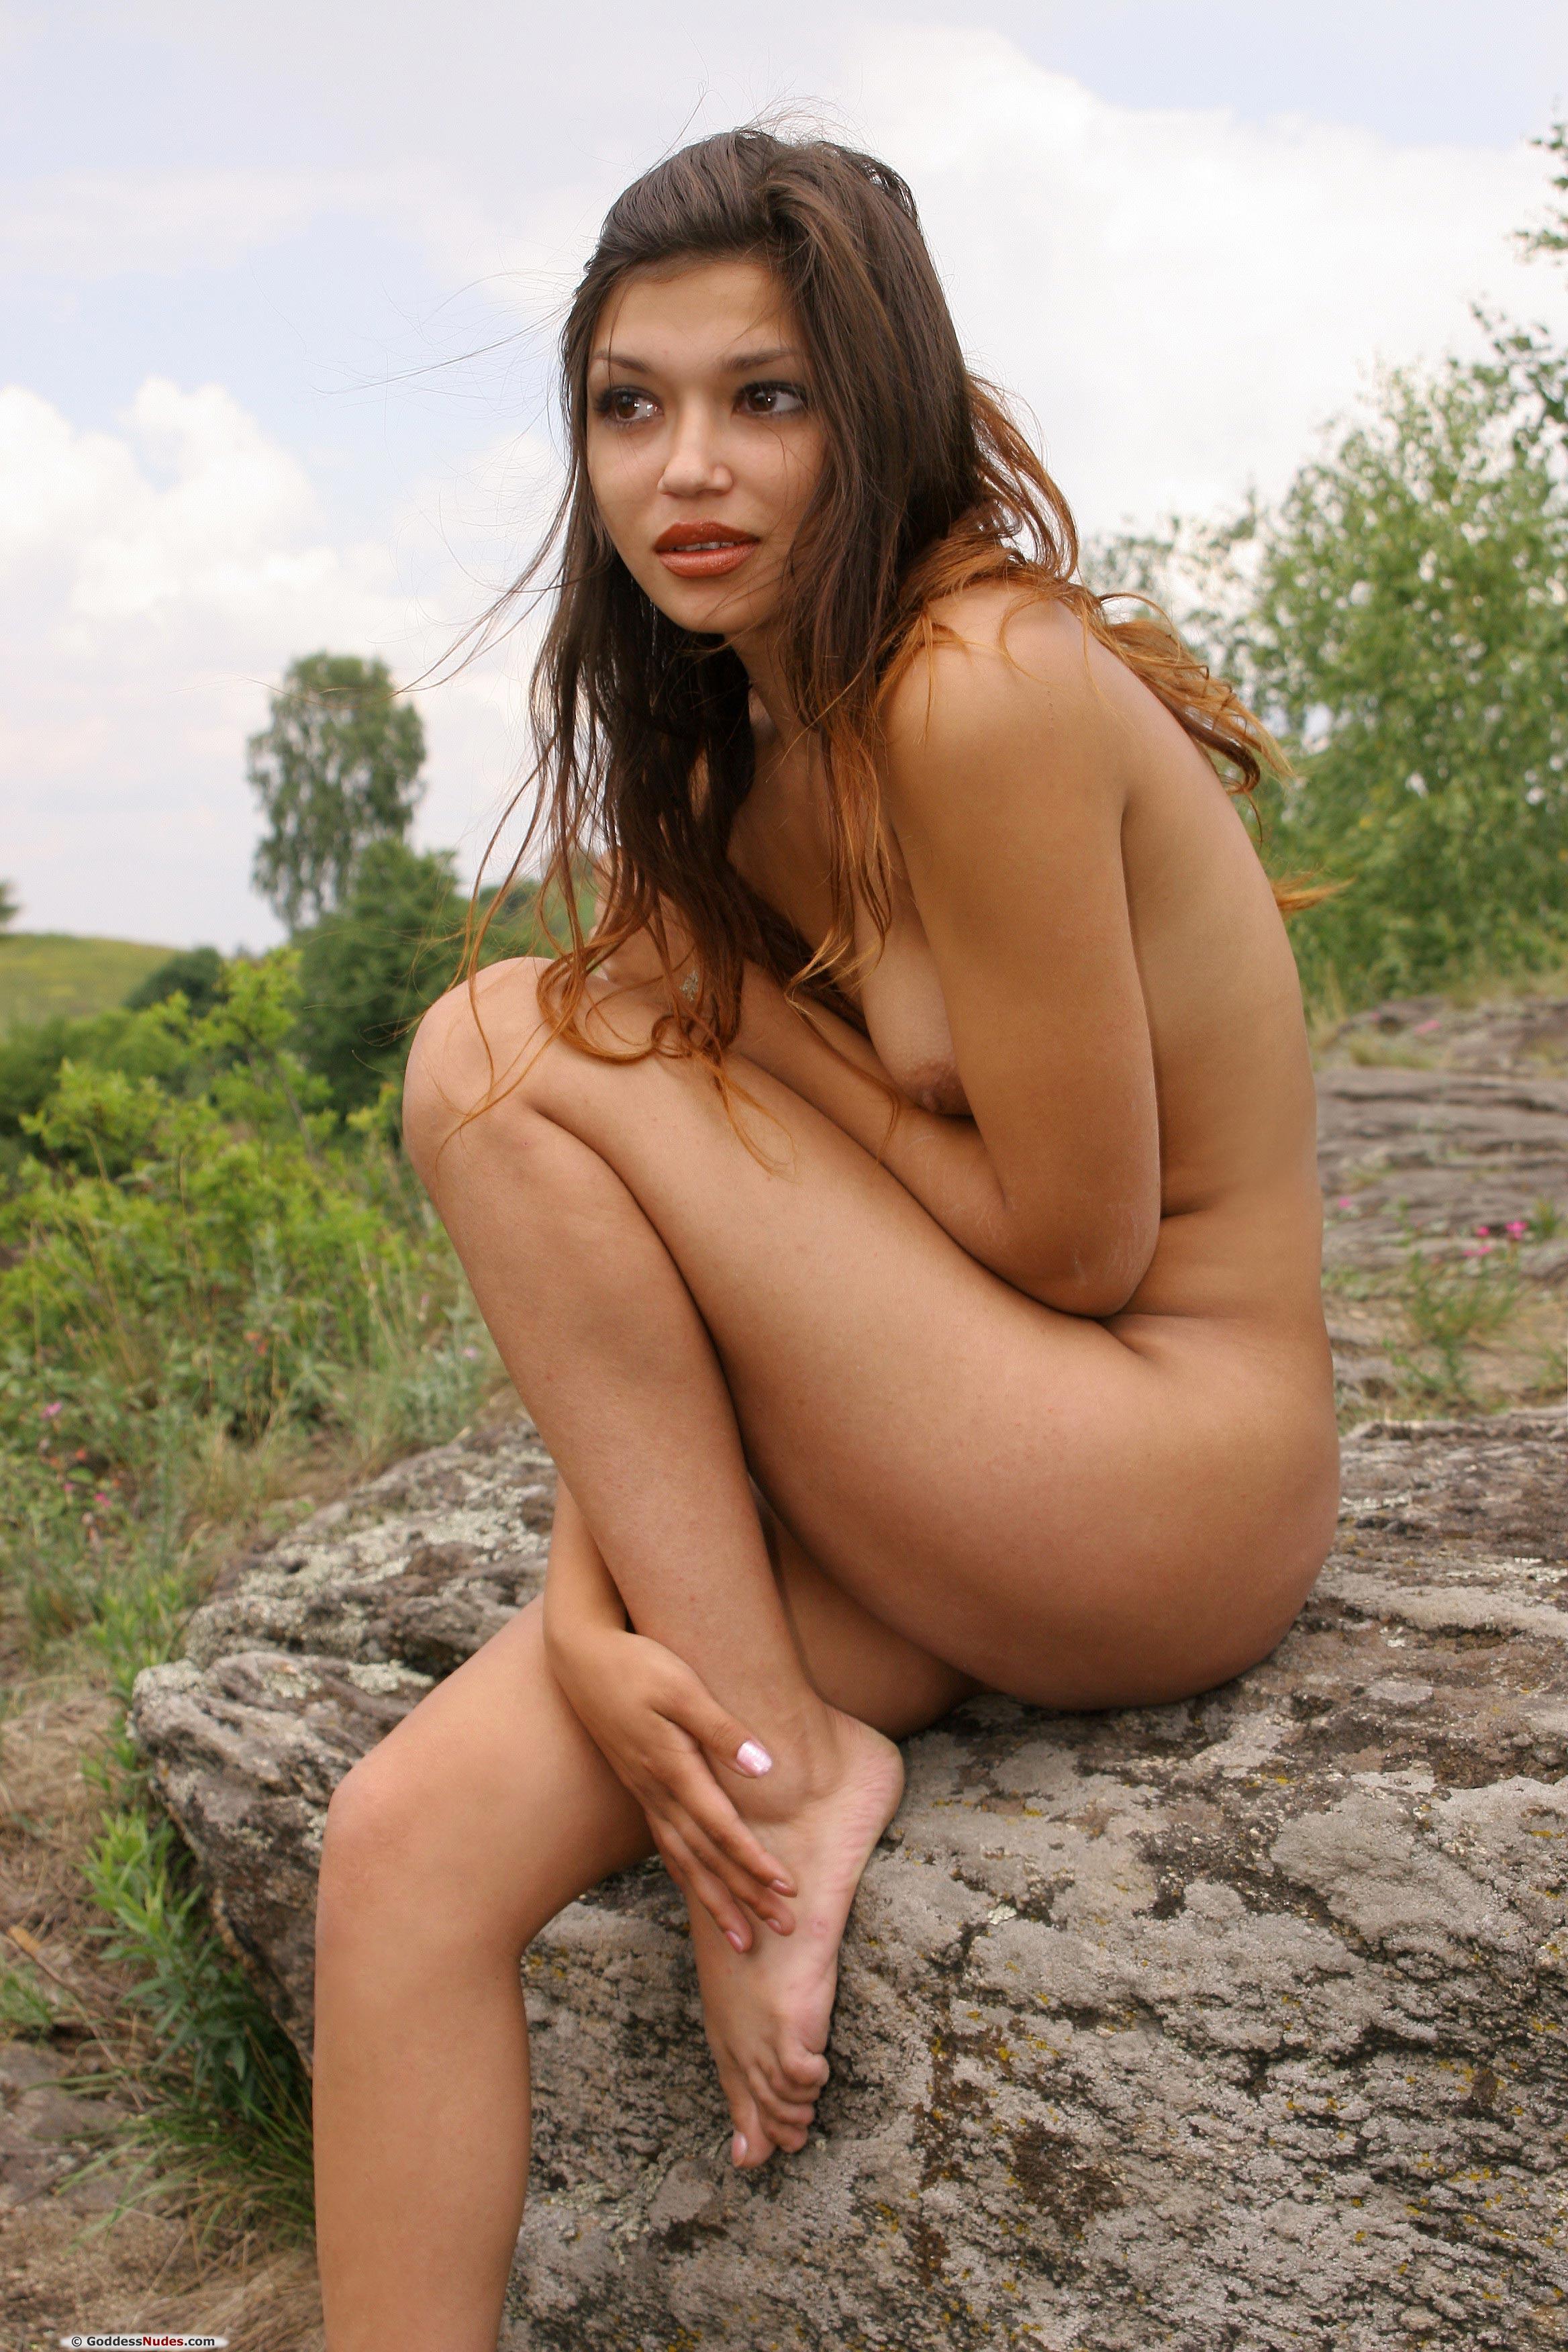 Remarkable, amusing Nudist photo dump galleries above understanding!